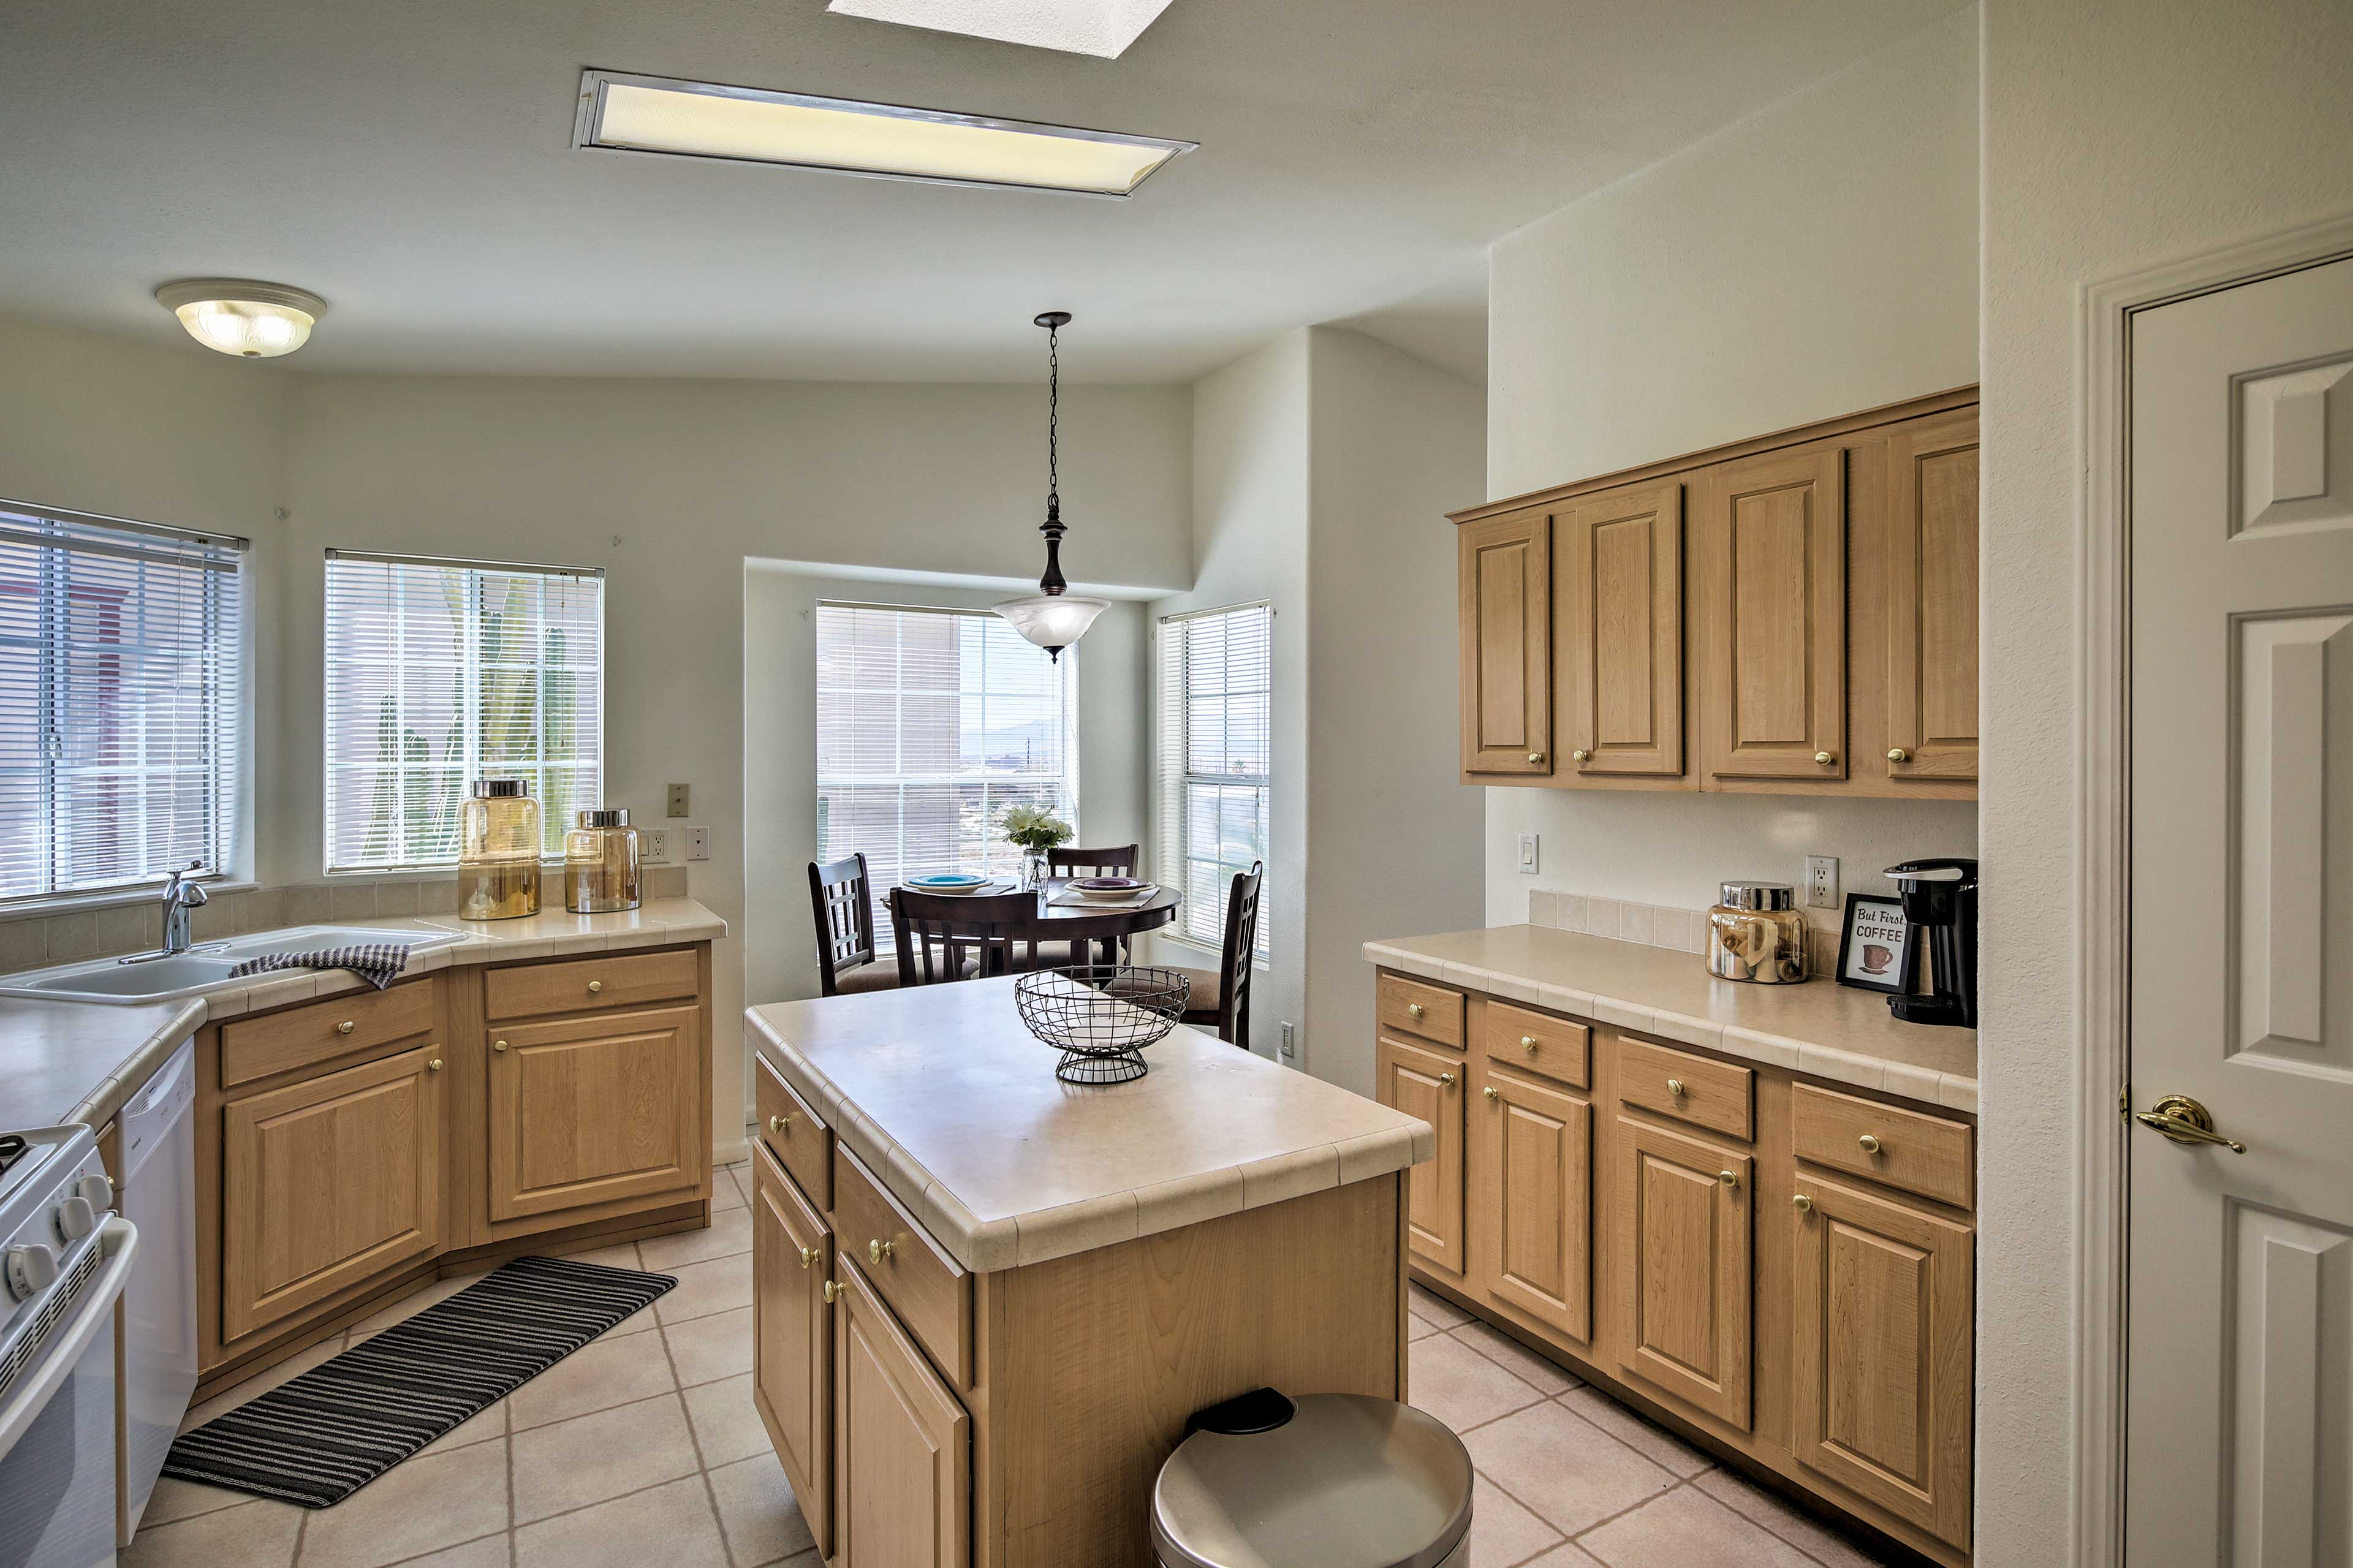 Kitchen | Cooking Basics